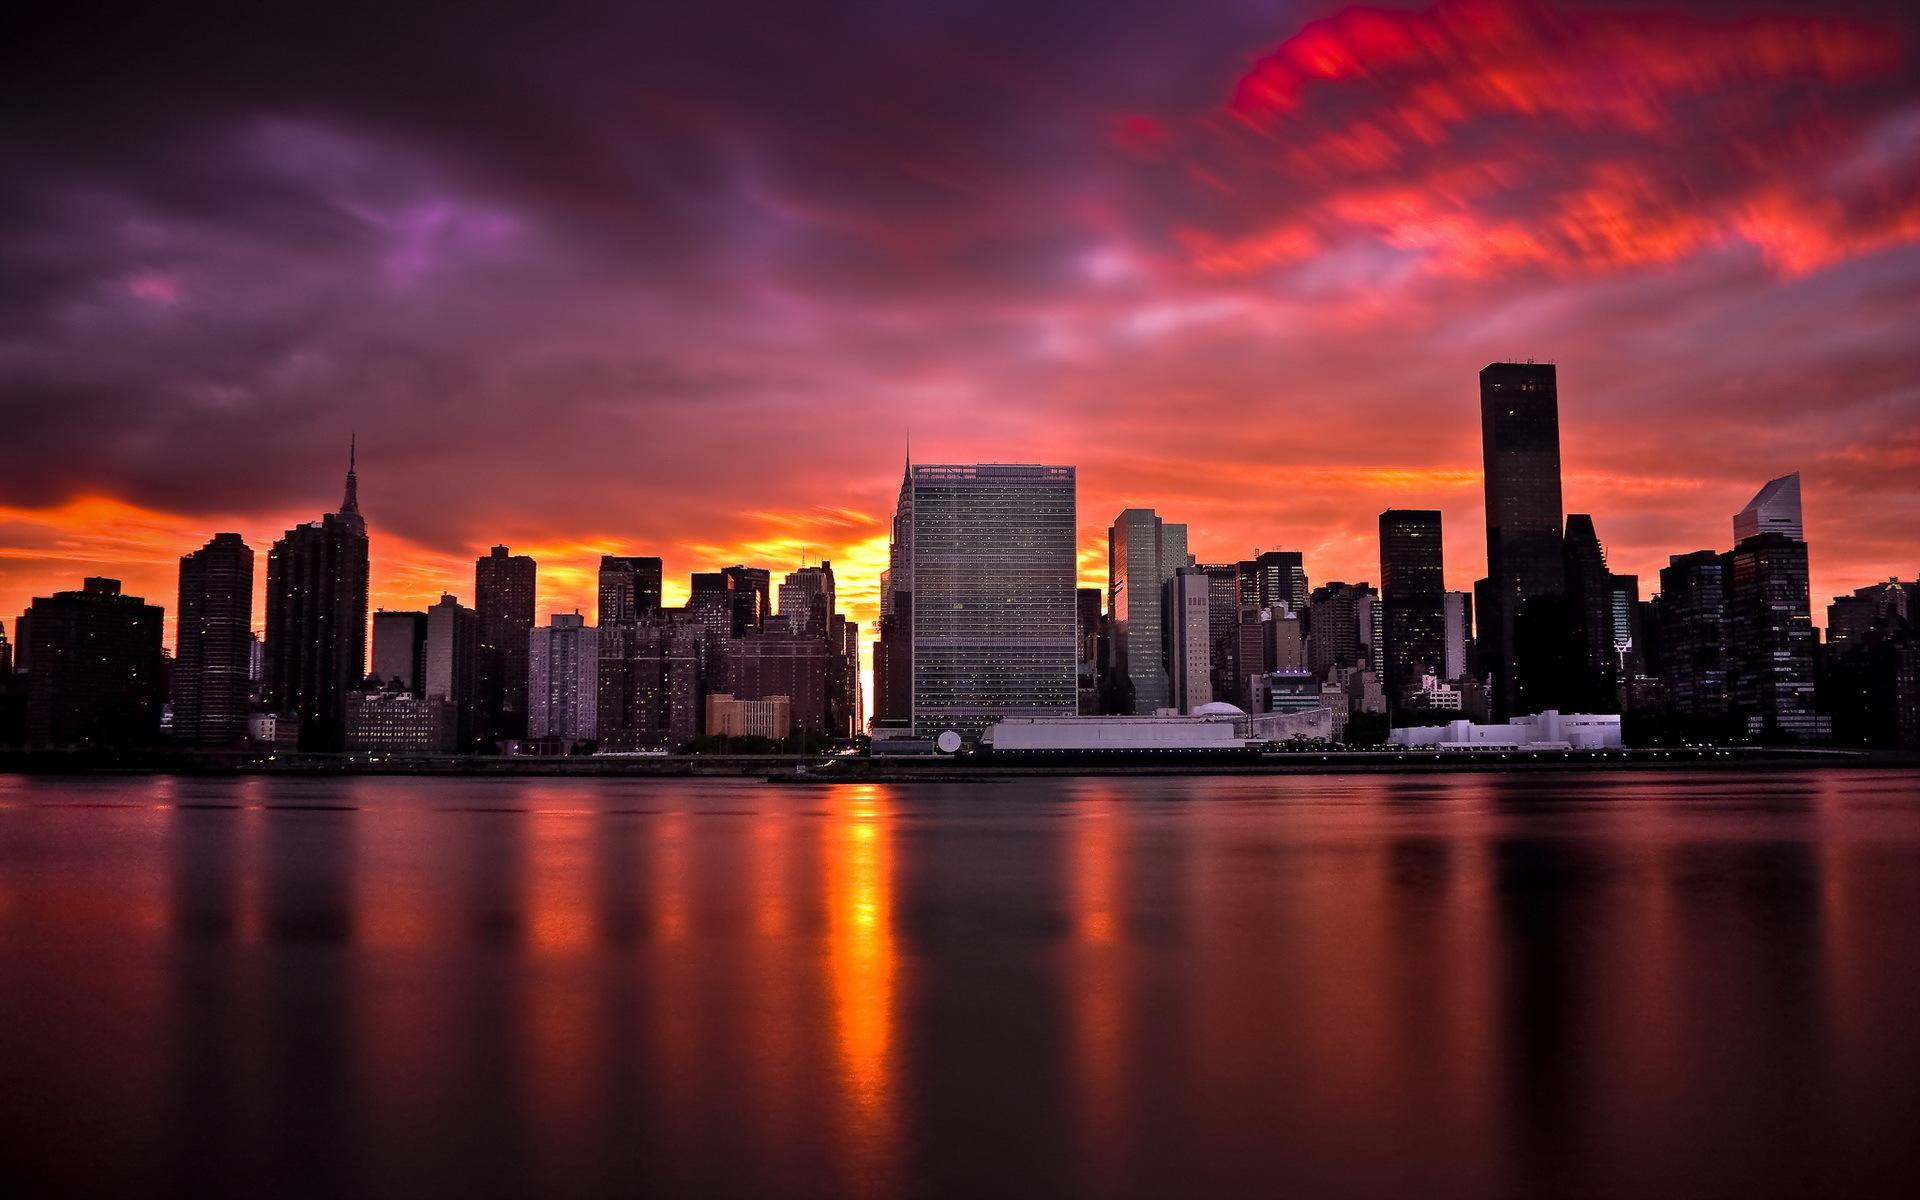 city sunset wallpaper 7106 - photo #23